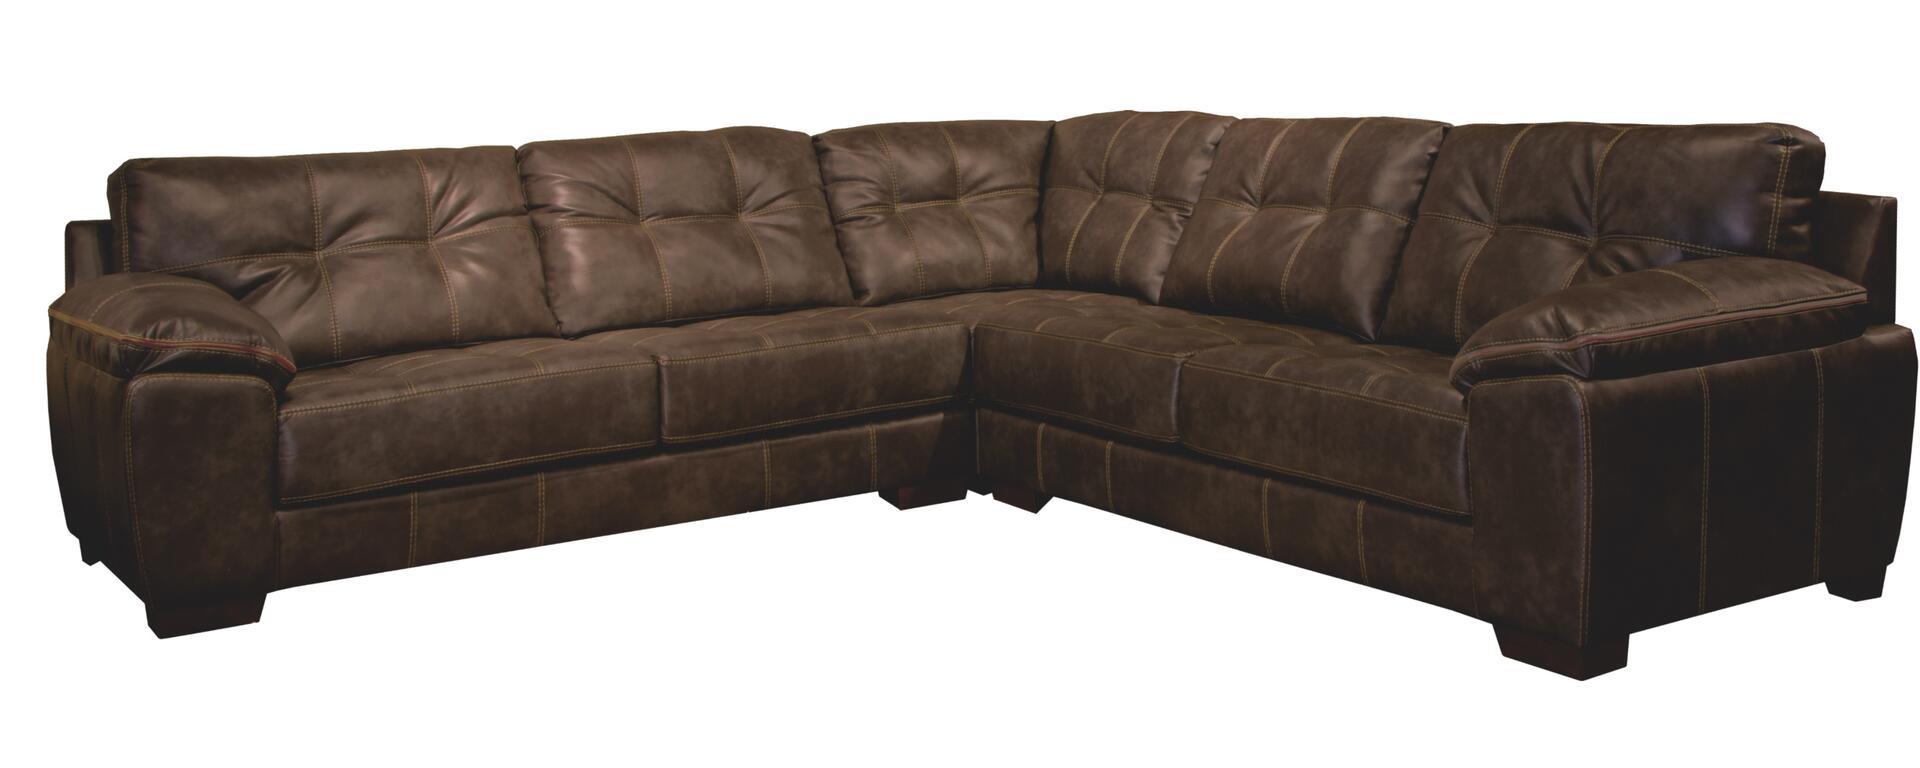 Pleasant Jackson Furniture 4396635973115209125209 Squirreltailoven Fun Painted Chair Ideas Images Squirreltailovenorg